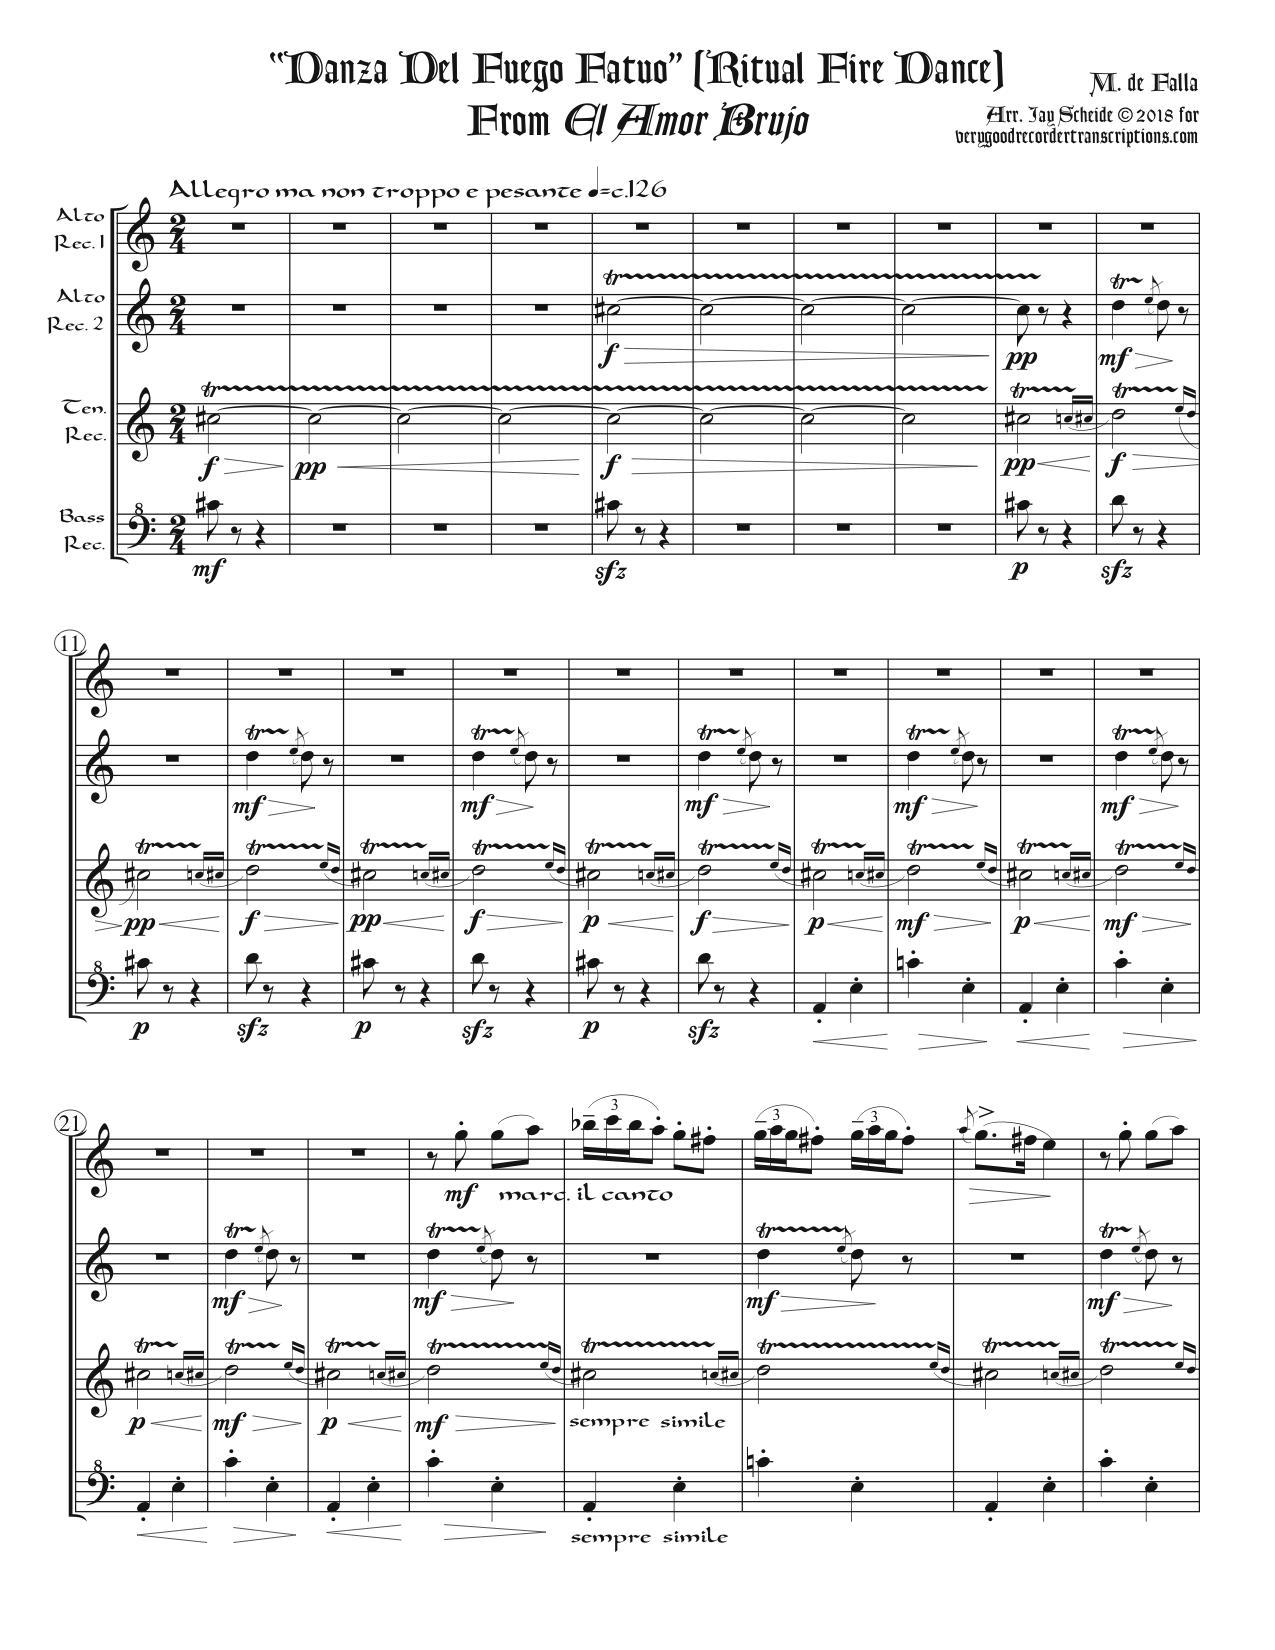 """Ritual Fire Dance"", from *El Amor Brujo*, arr. for recorder quartet"